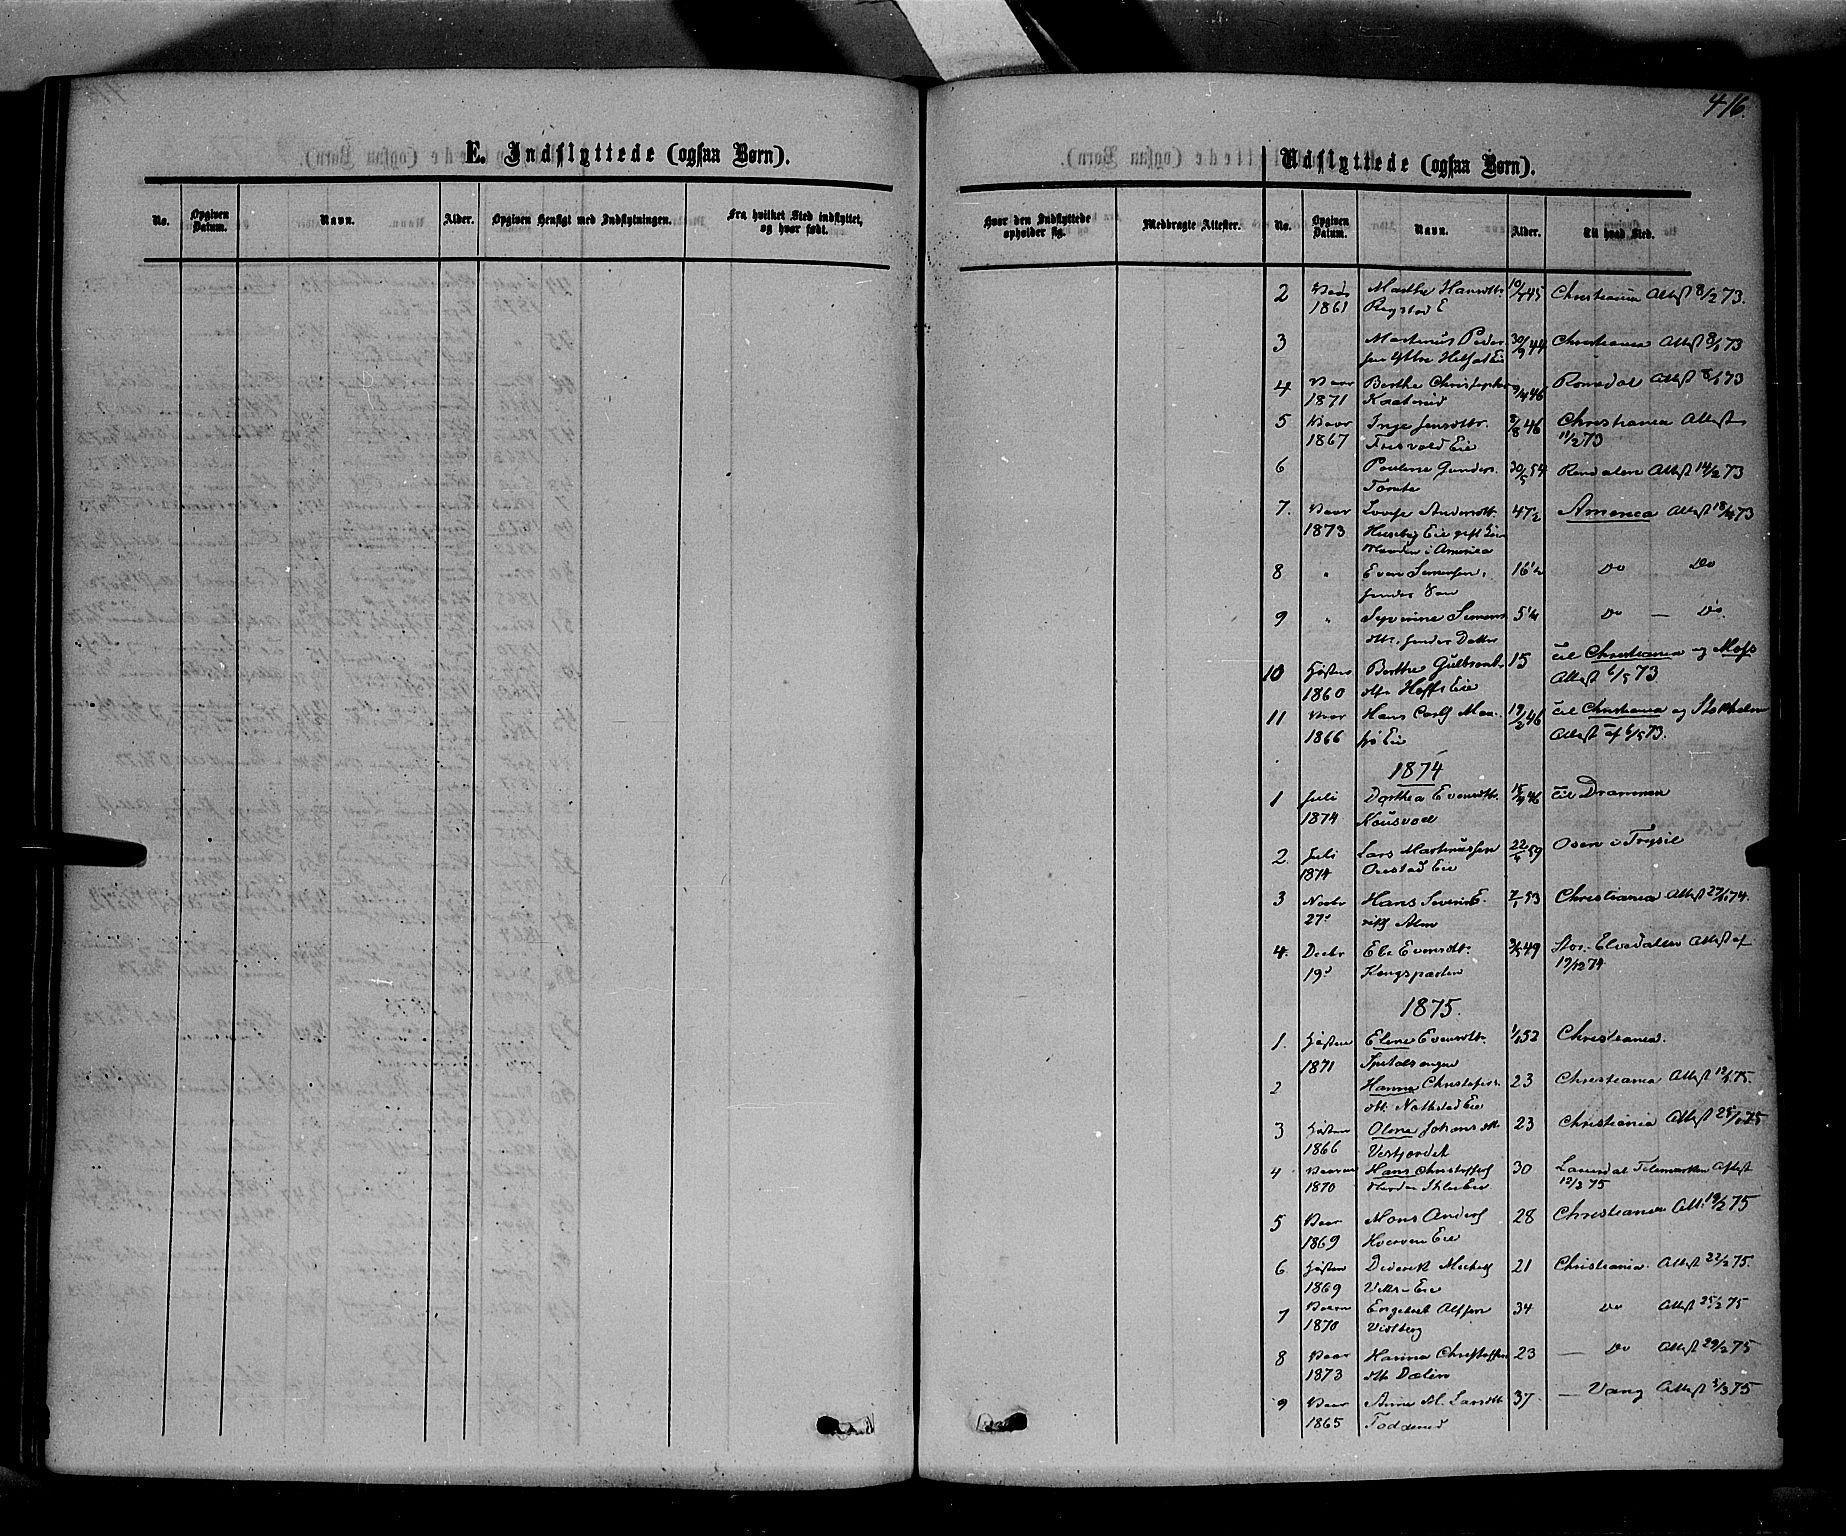 SAH, Stange prestekontor, K/L0013: Ministerialbok nr. 13, 1862-1879, s. 416